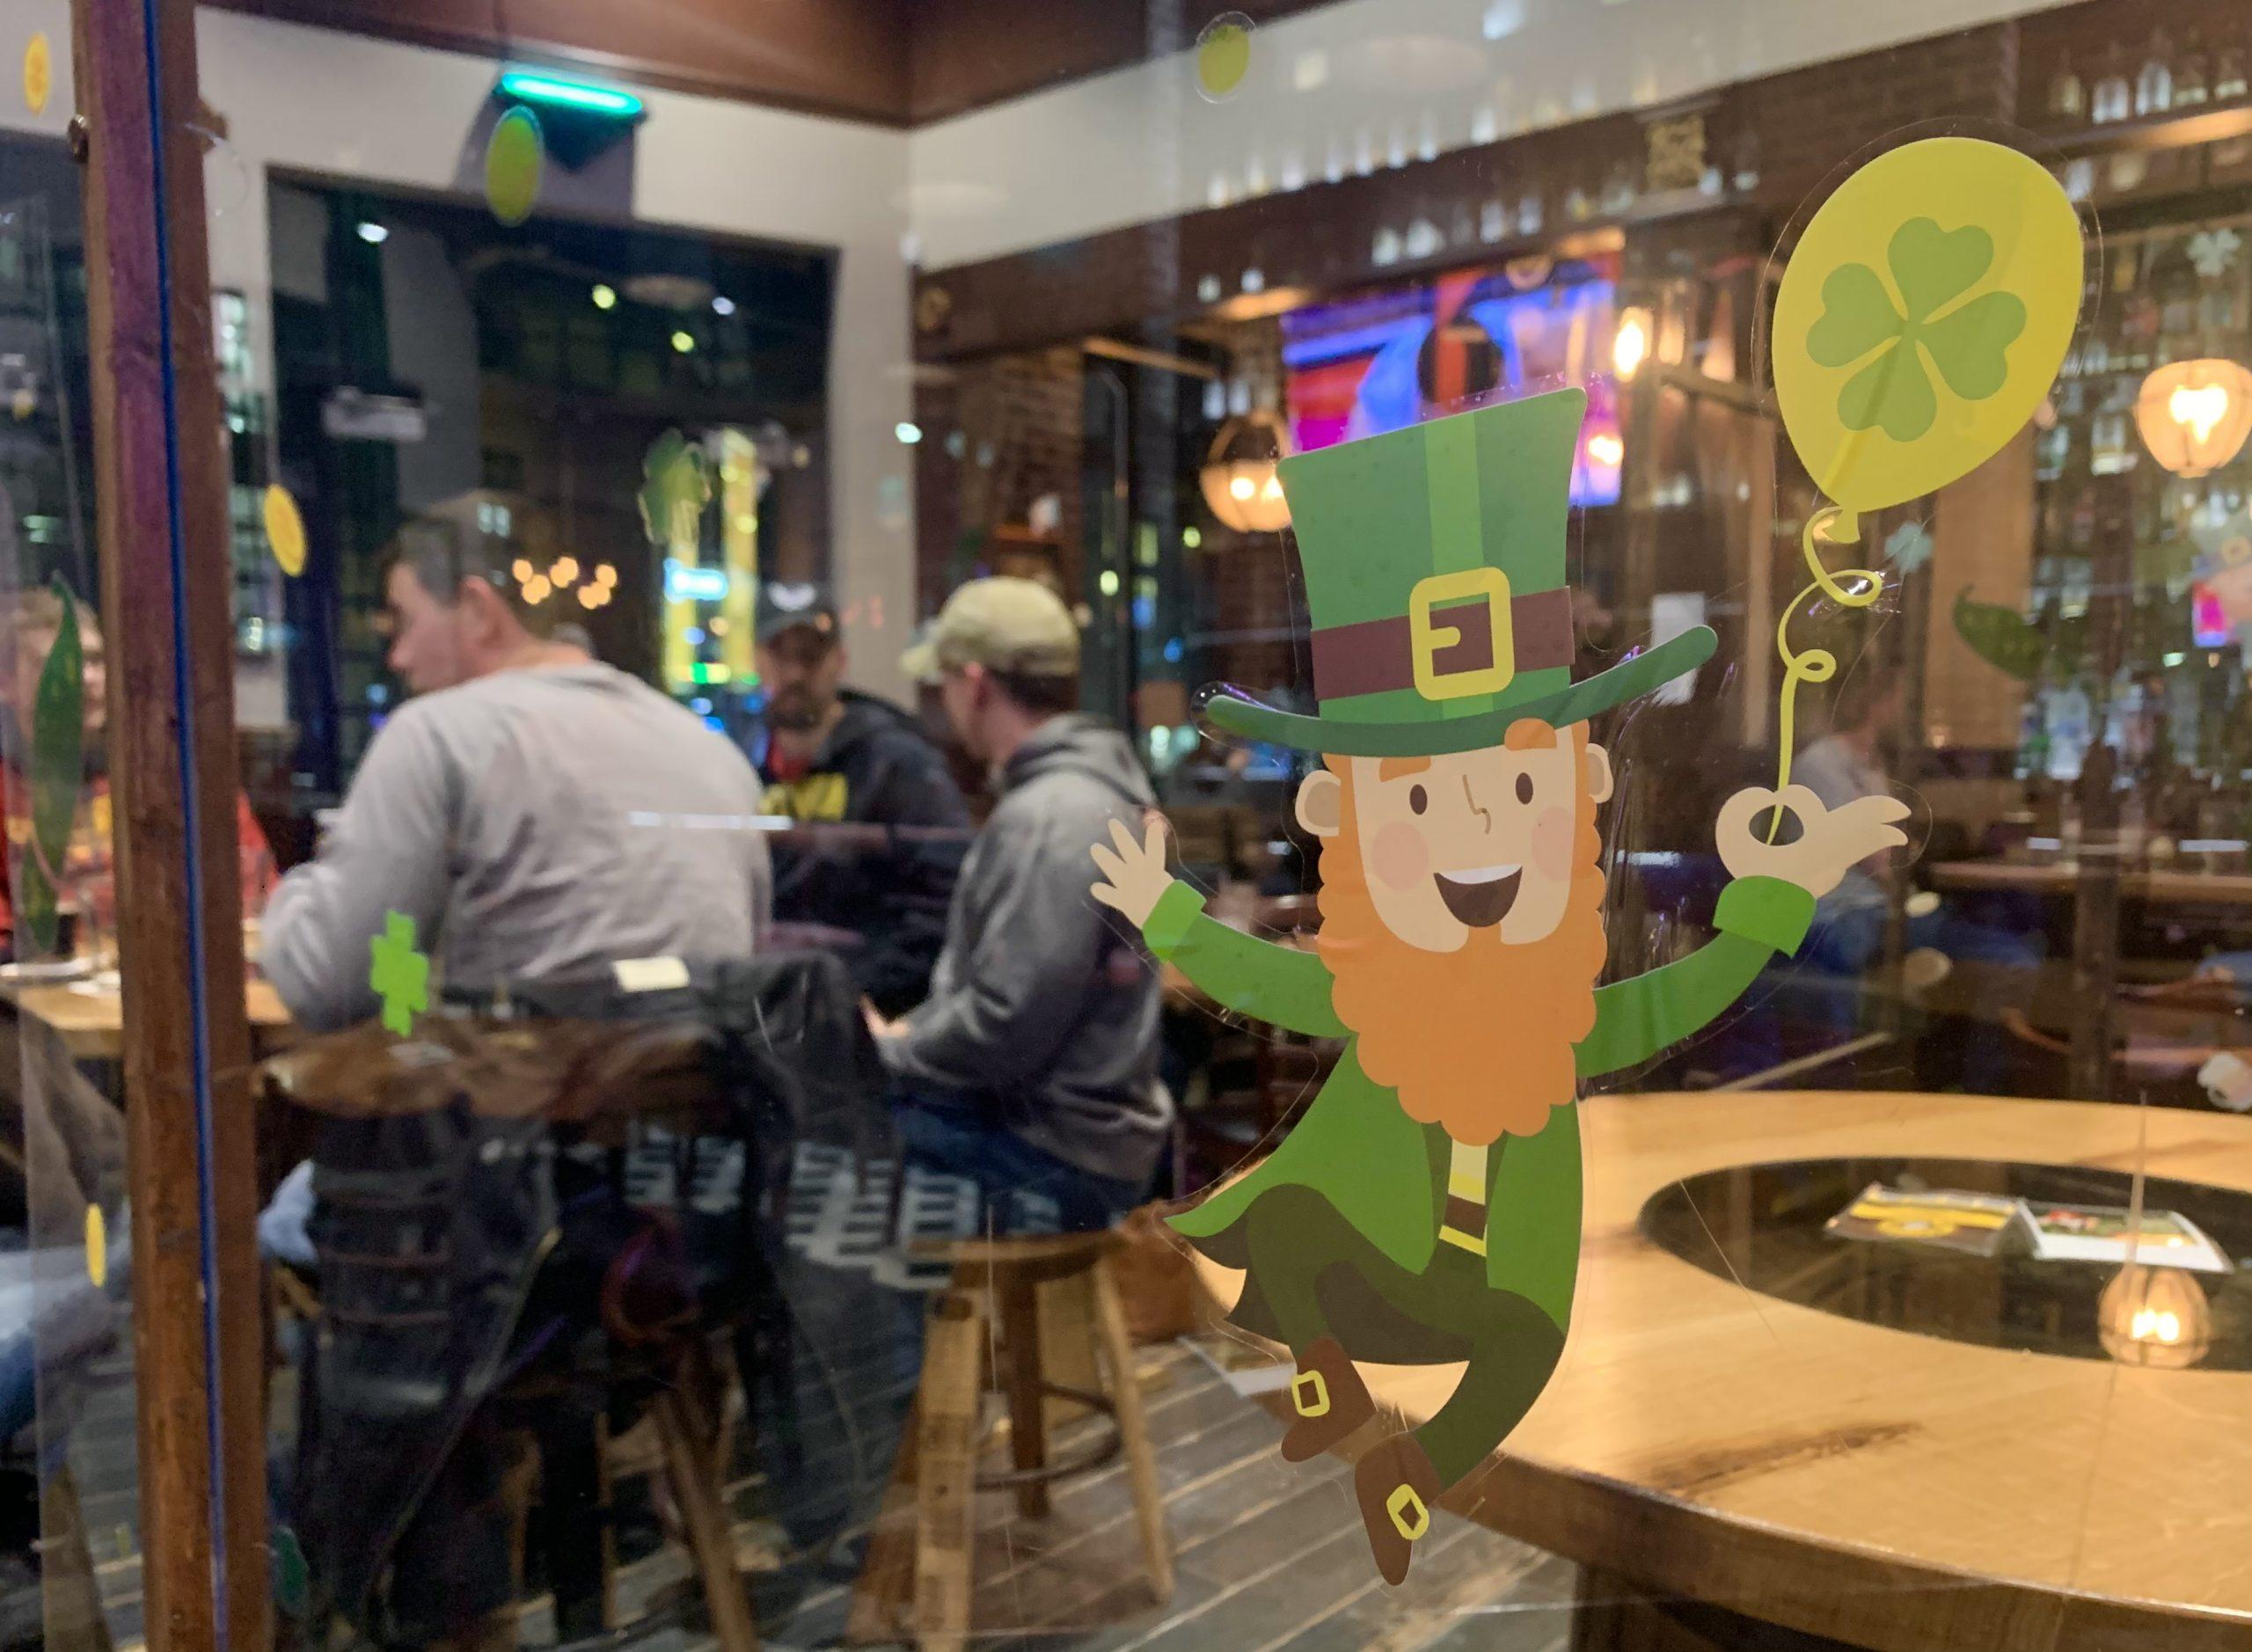 One year after shutdown, Iowa restaurants, bars celebrate St. Patrick's Day